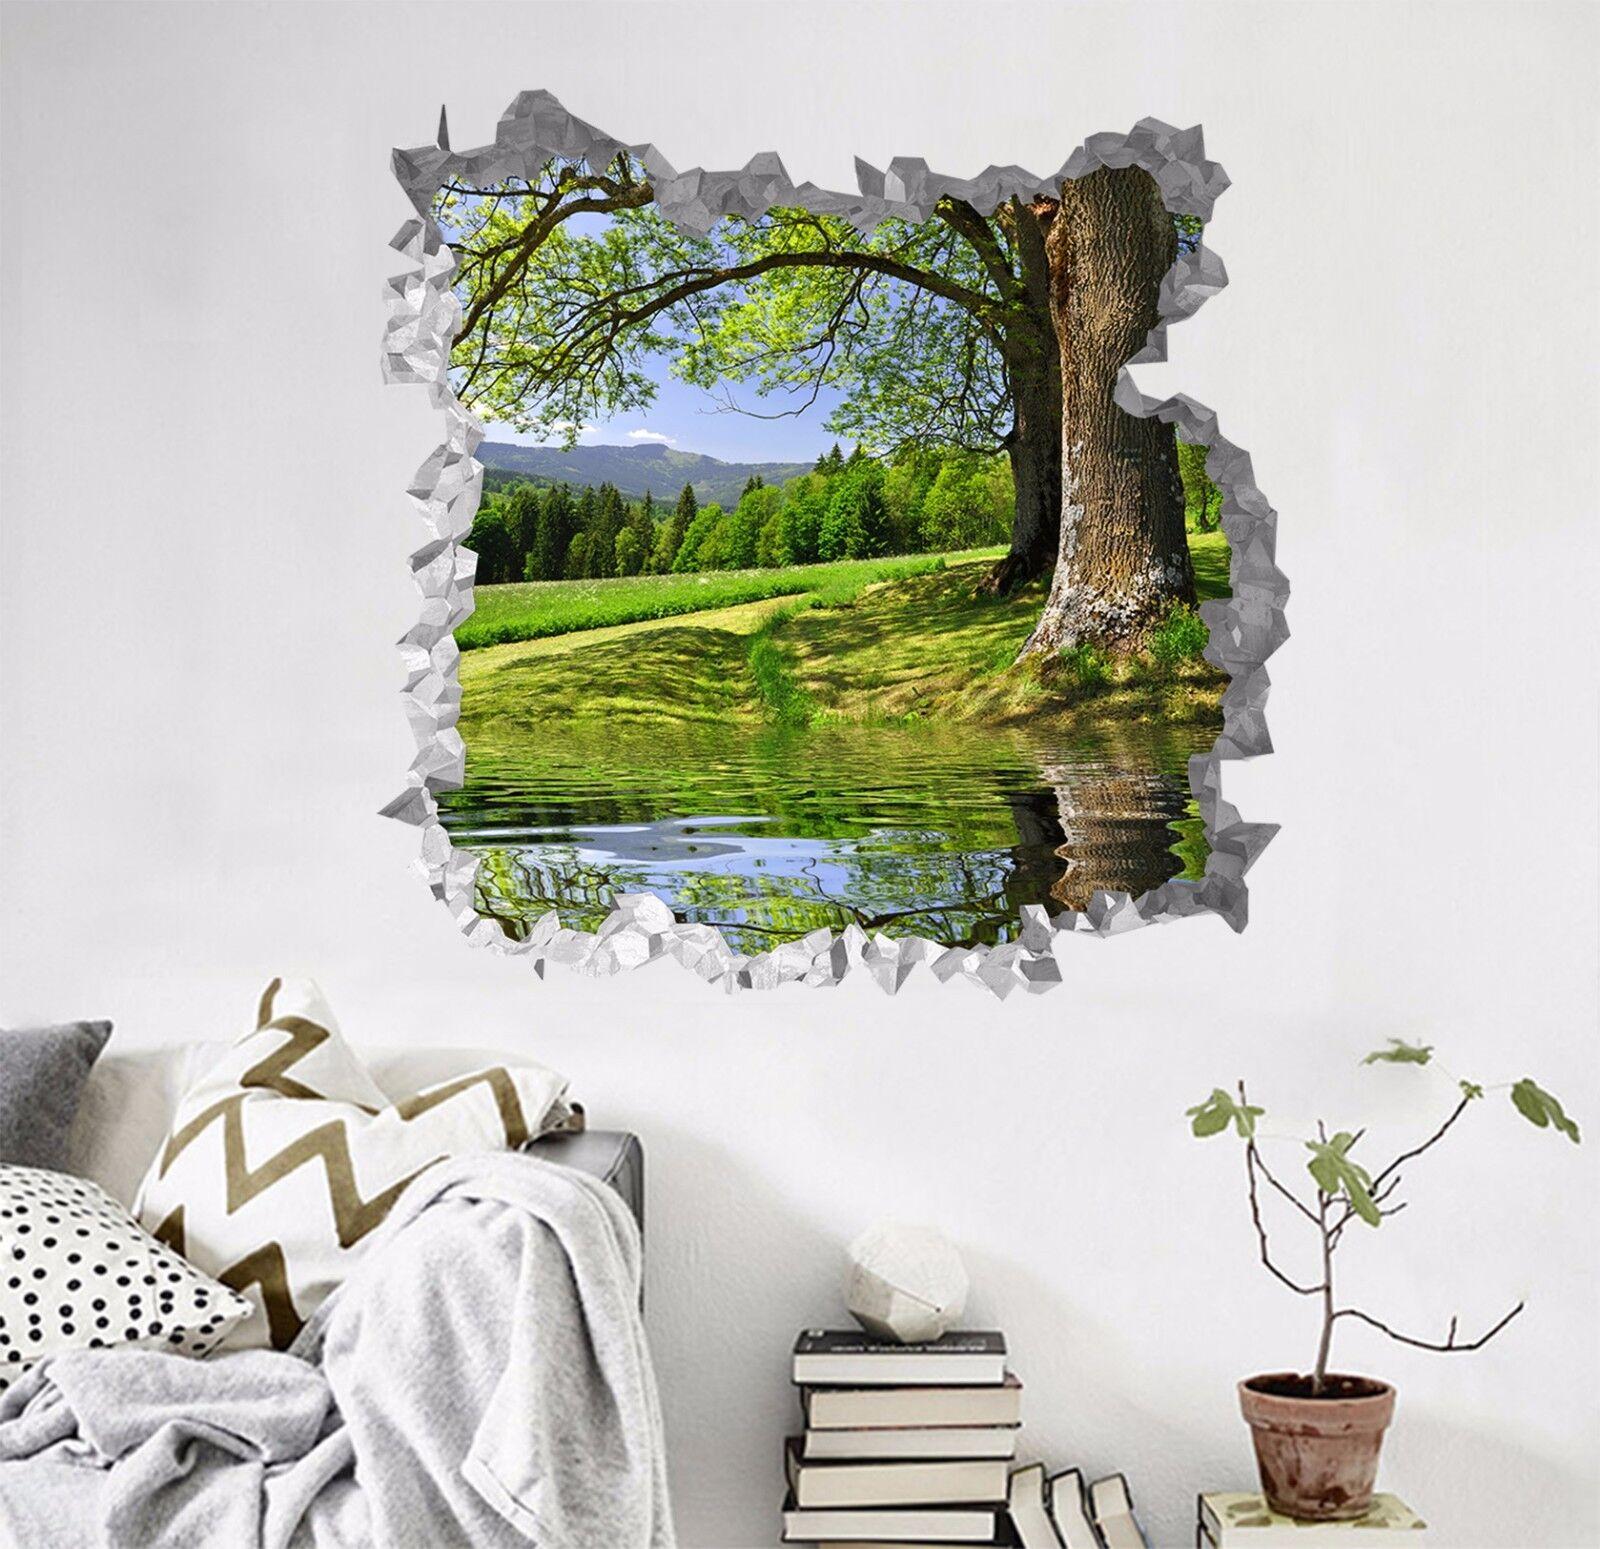 3D Falbero Grün Lago 190 Parete Murales Parete Adesivi Decal Sfondamento IT